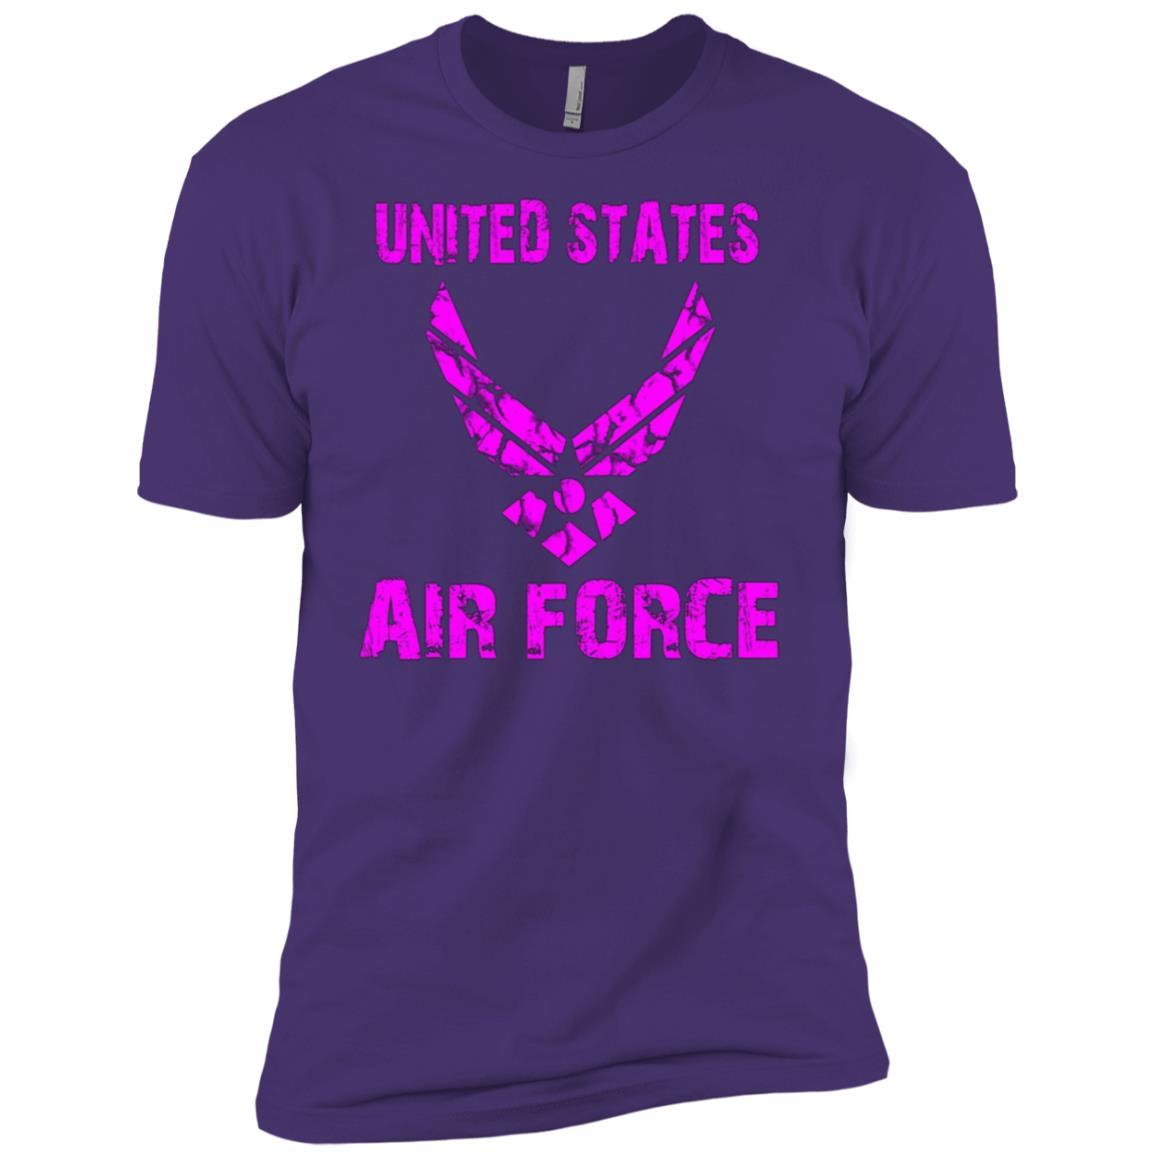 United States Air Force Original Pink Women's Men Short Sleeve T-Shirt